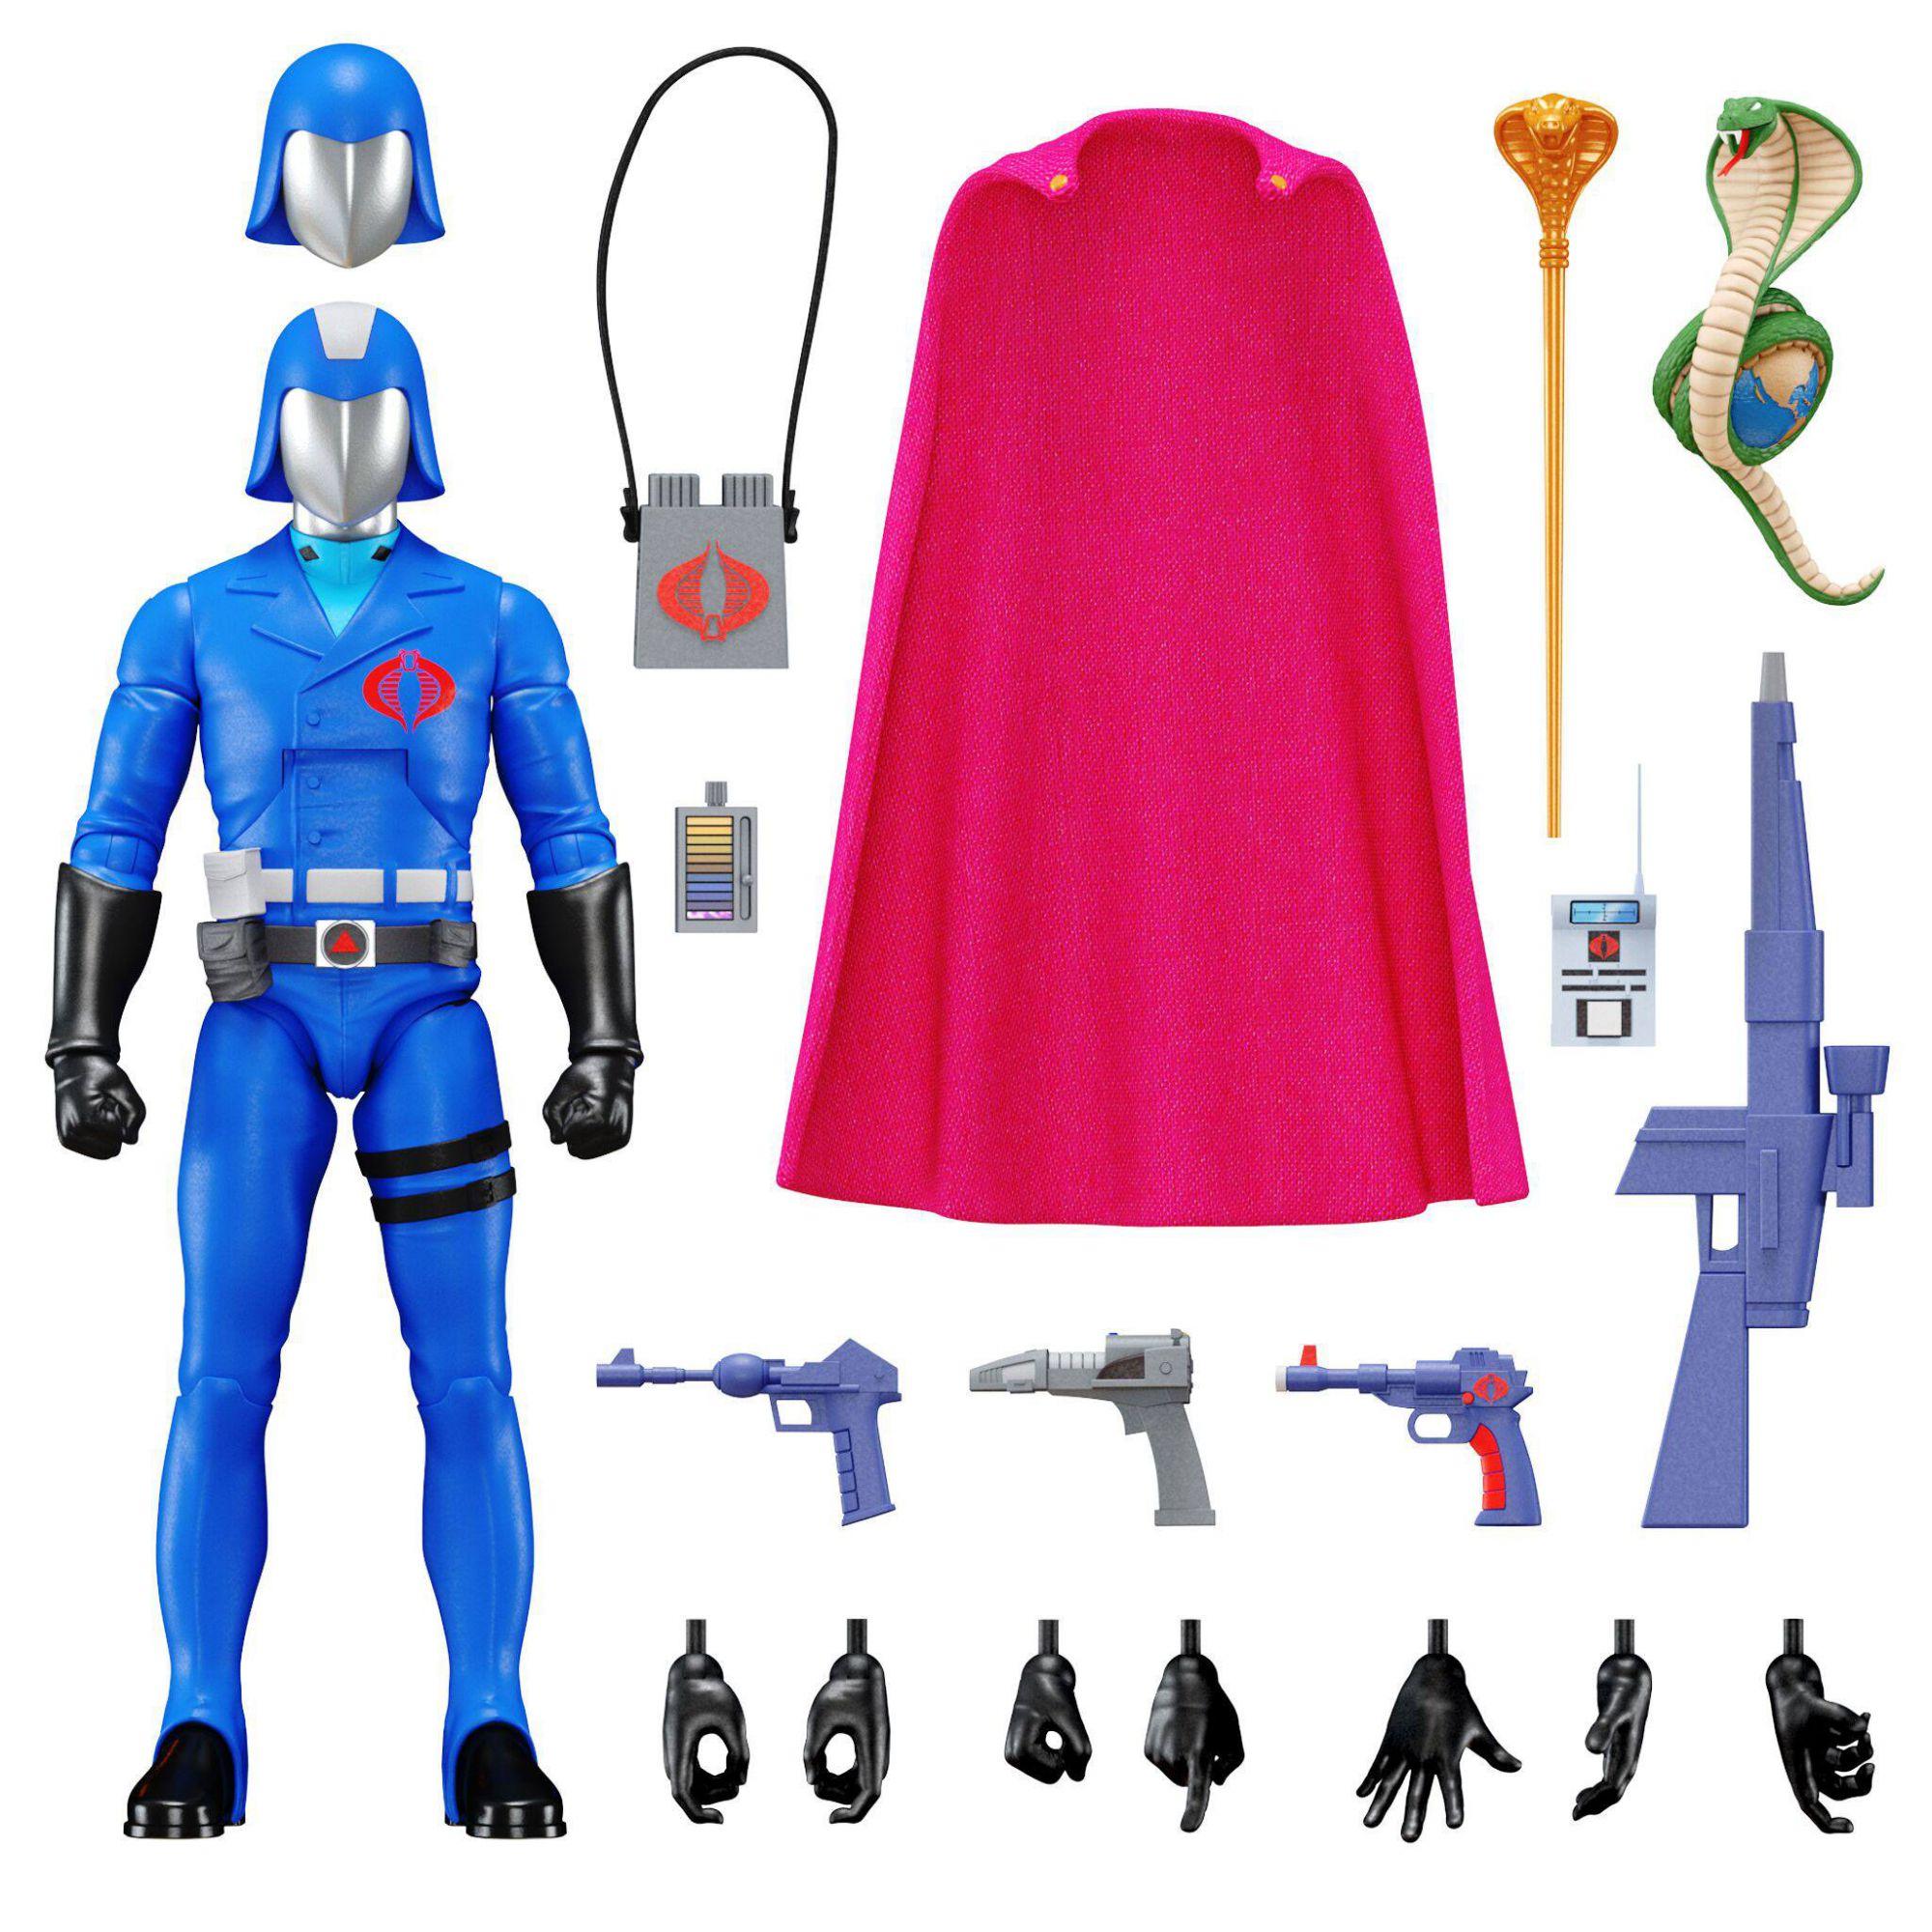 G.I.JOE - Super7 - Figurine 17cm Ultimates  - Cobra Commander